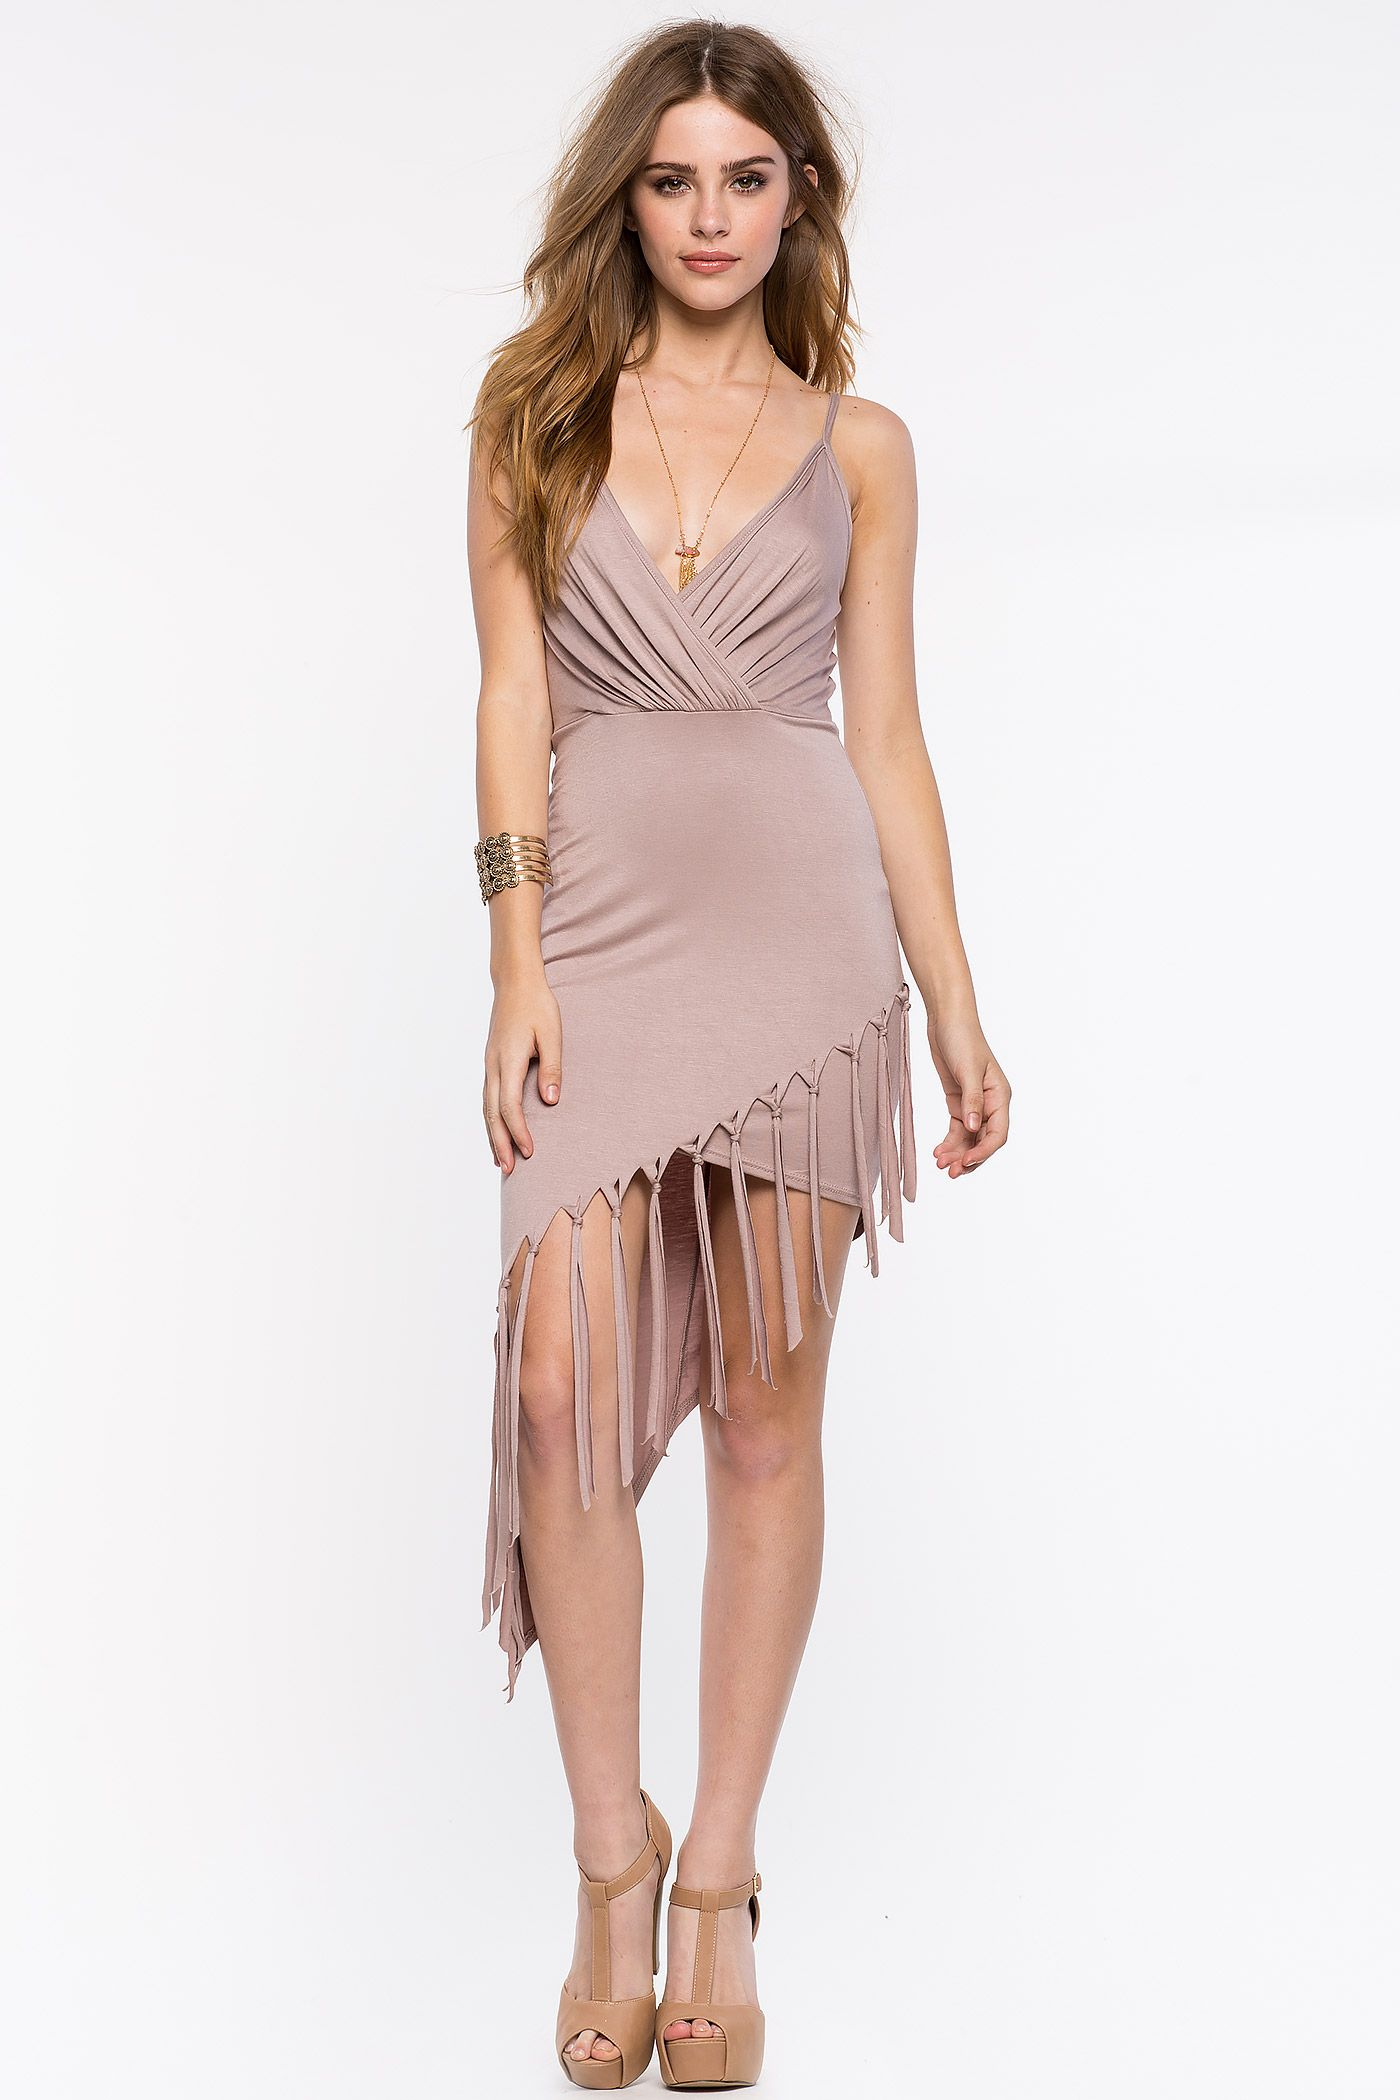 306c1908a4 Women s Bodycon Dresses